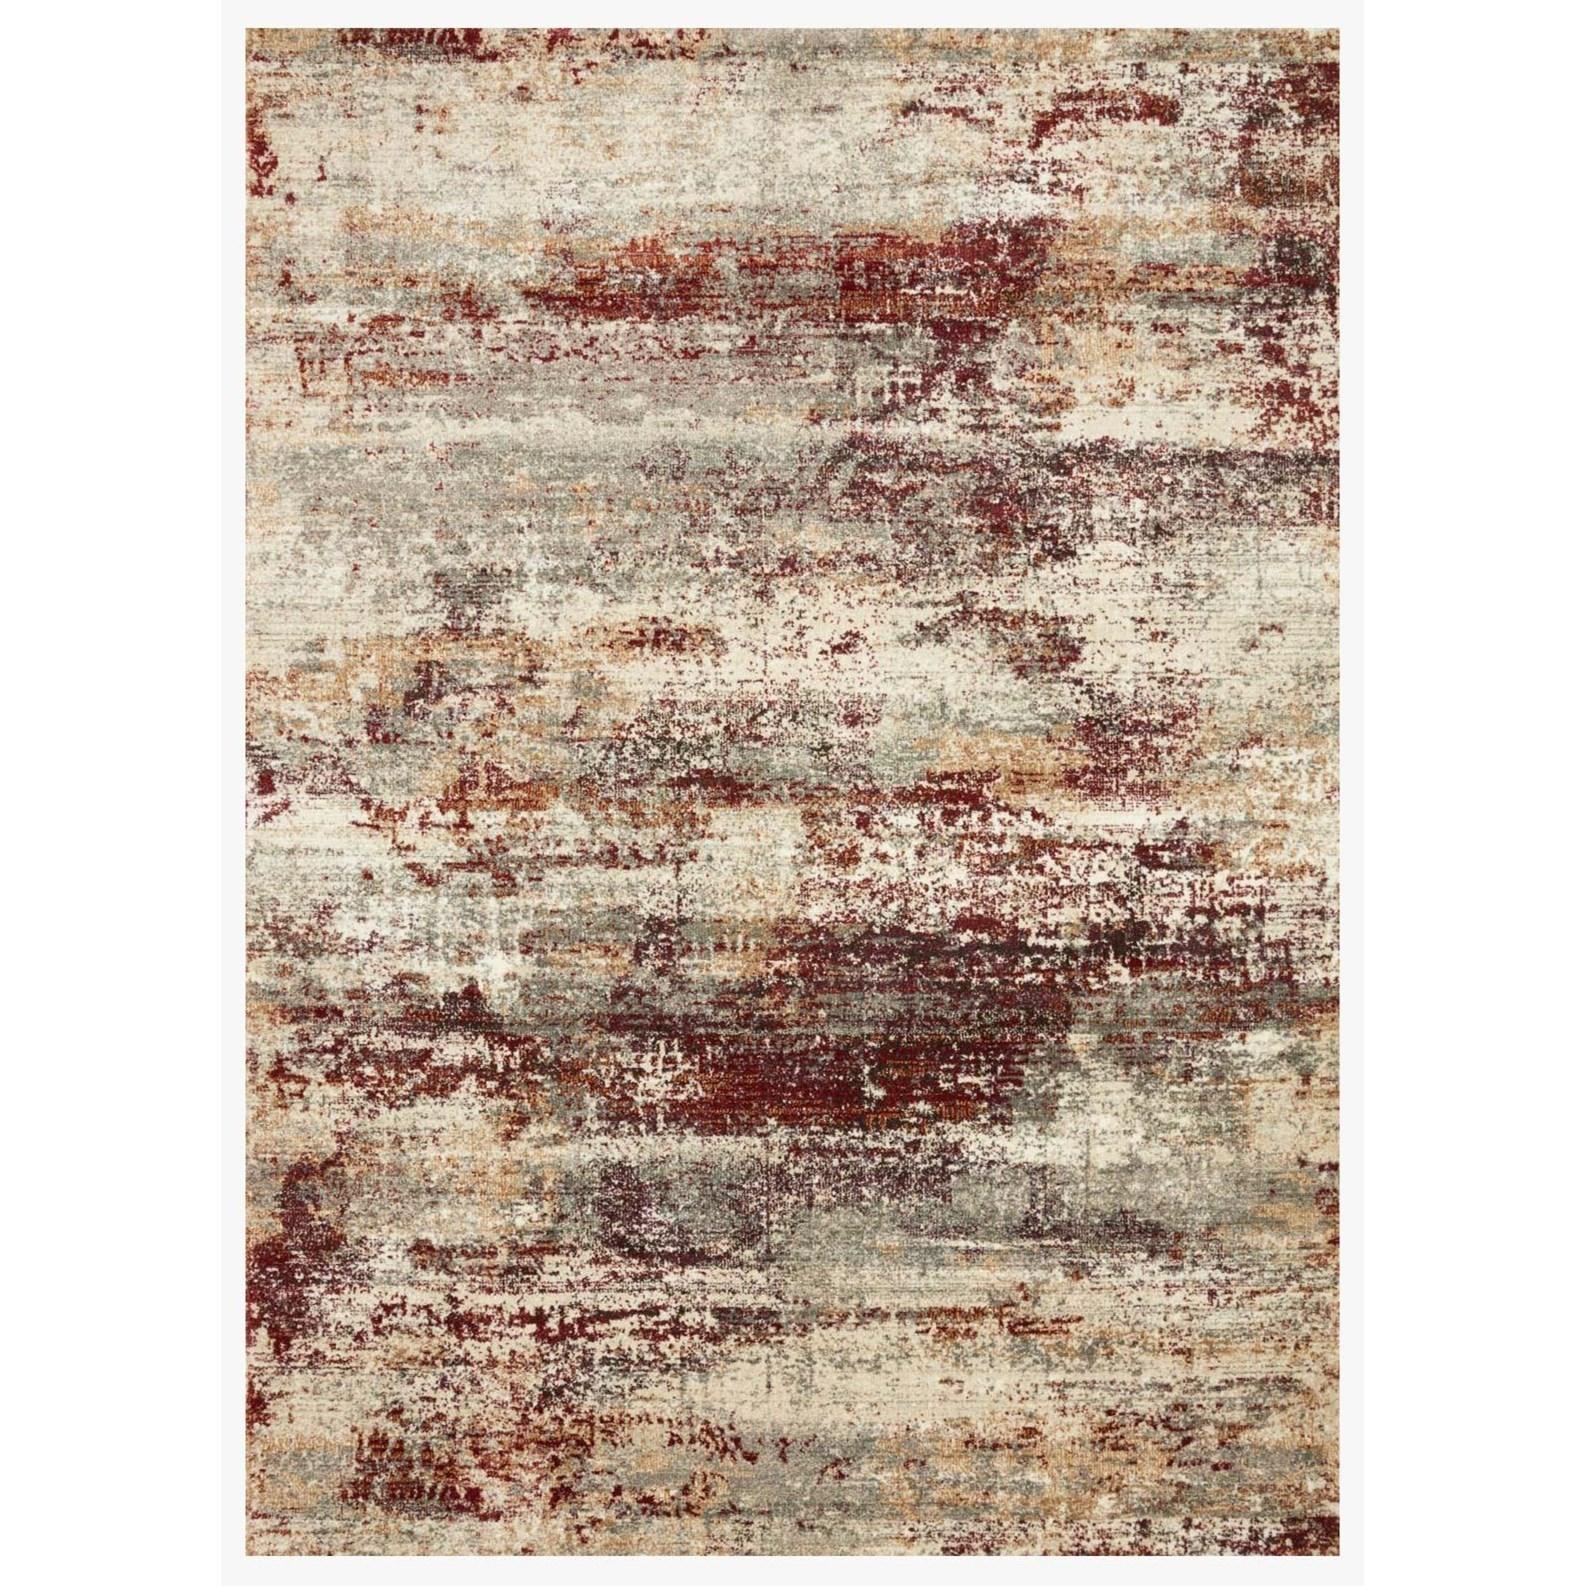 "Jasmine 18"" x 18""  Dove / Rust Rug by Loloi Rugs at Virginia Furniture Market"